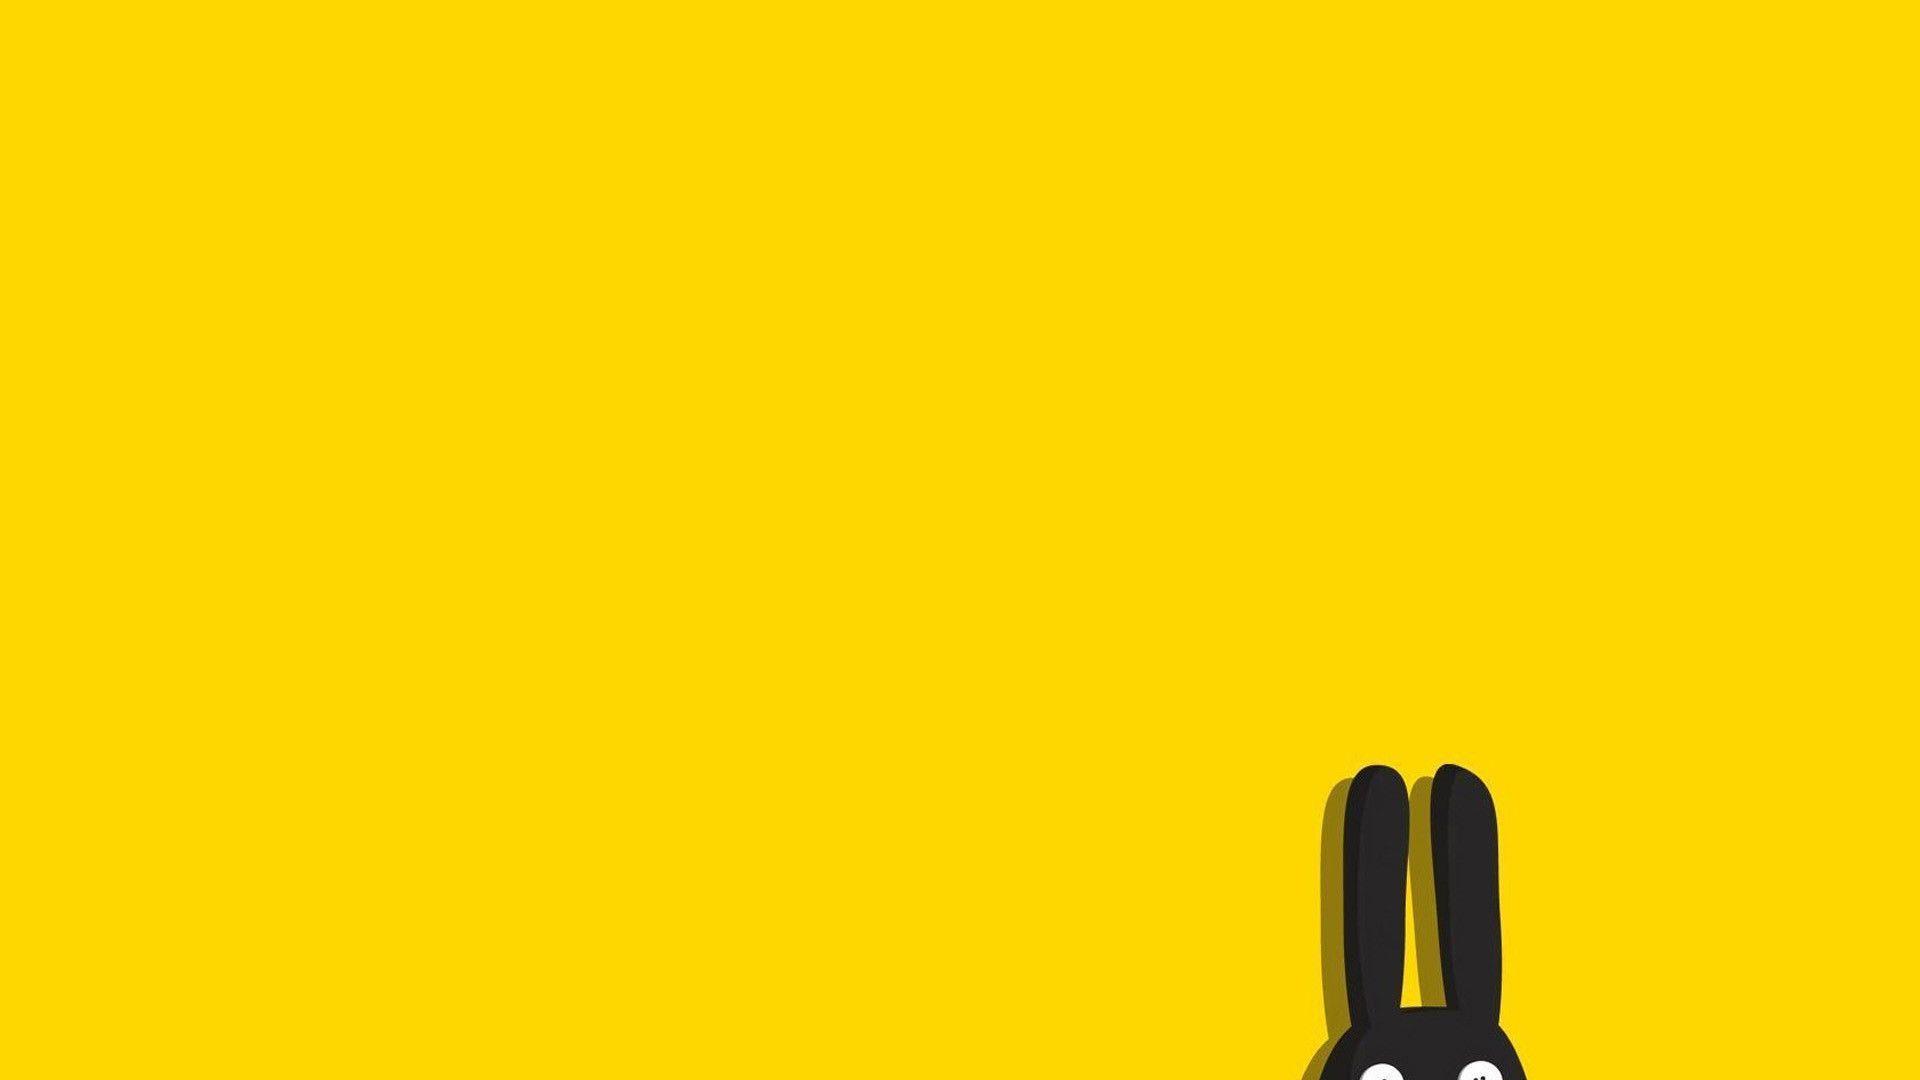 yellow aesthetic phone wallpaper